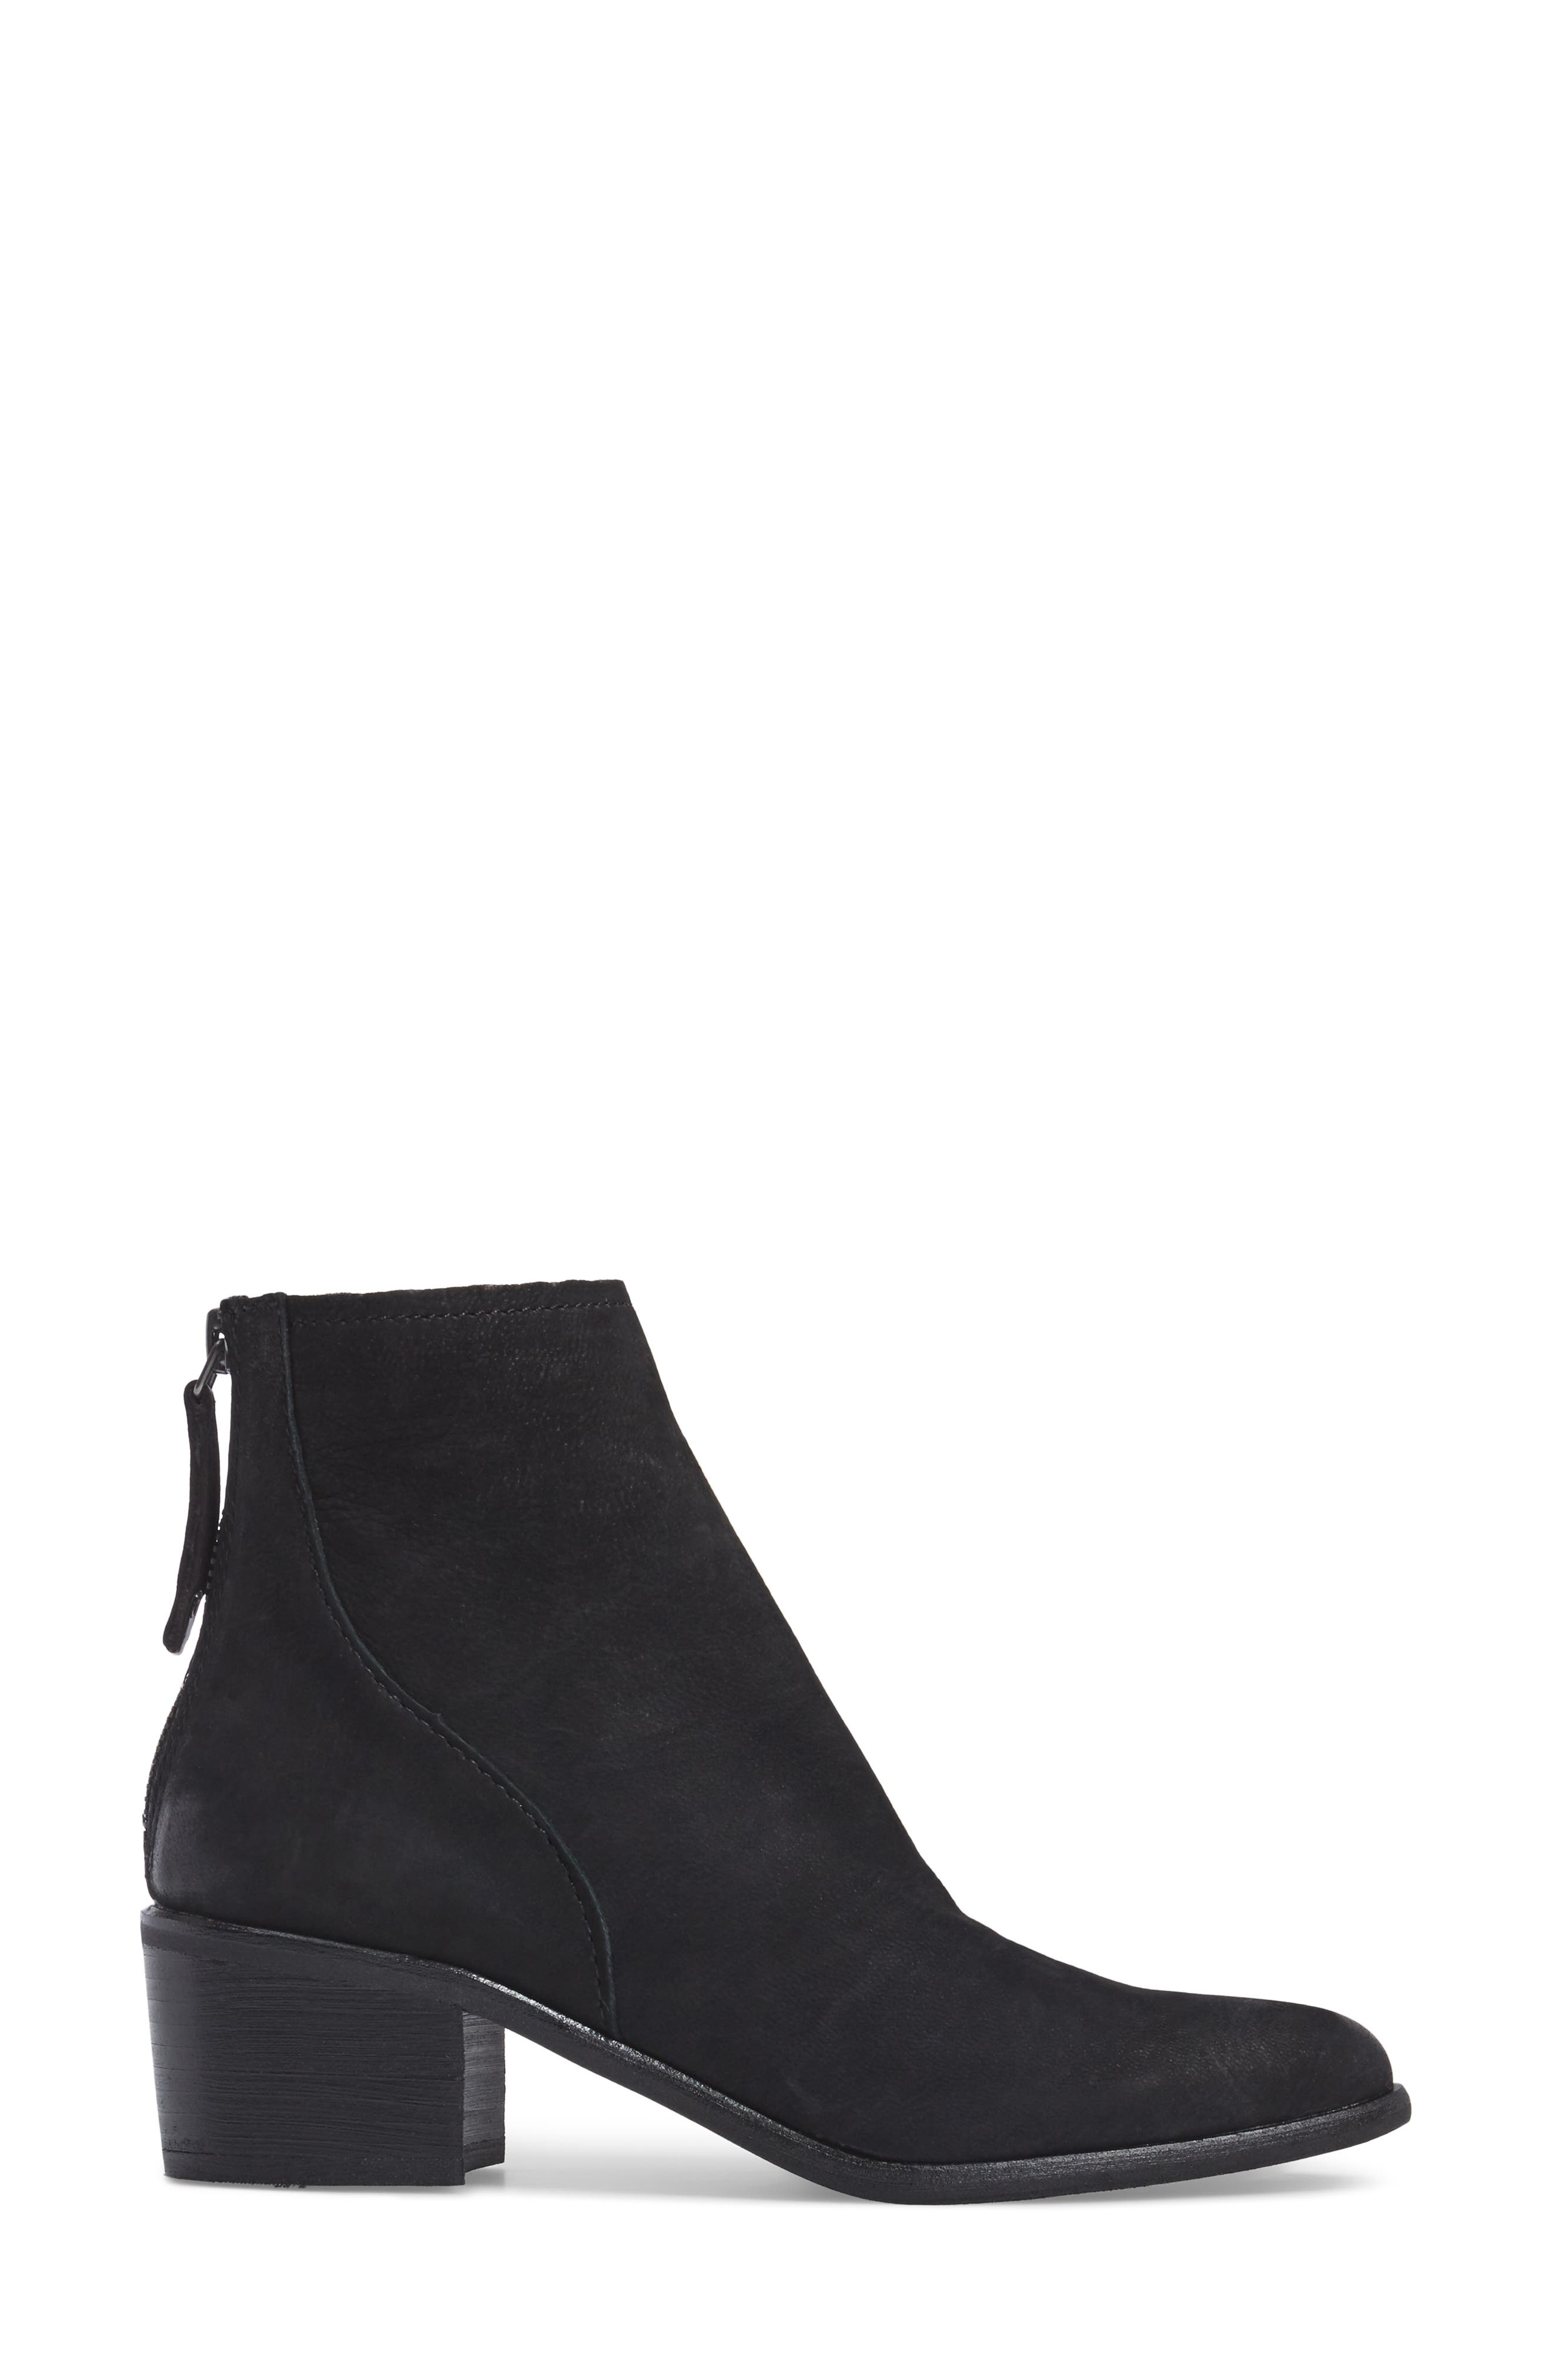 Cassius Block Heel Bootie,                             Alternate thumbnail 3, color,                             Black Nubuck Leather